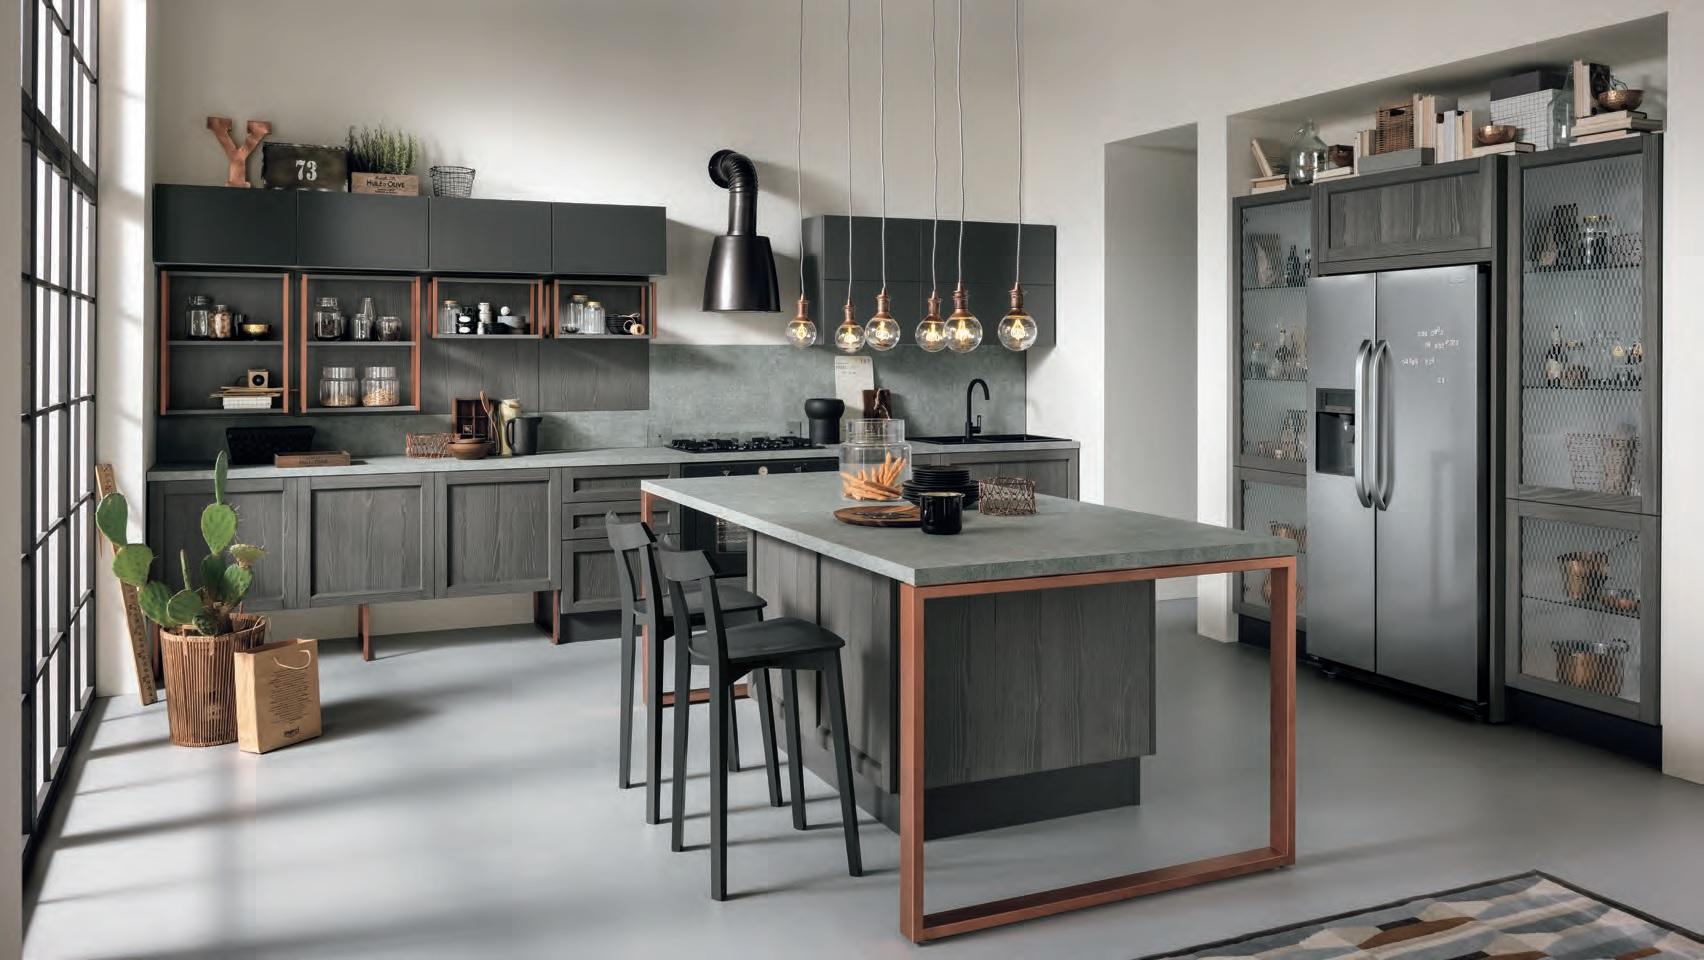 Cucina Talea stile new classic